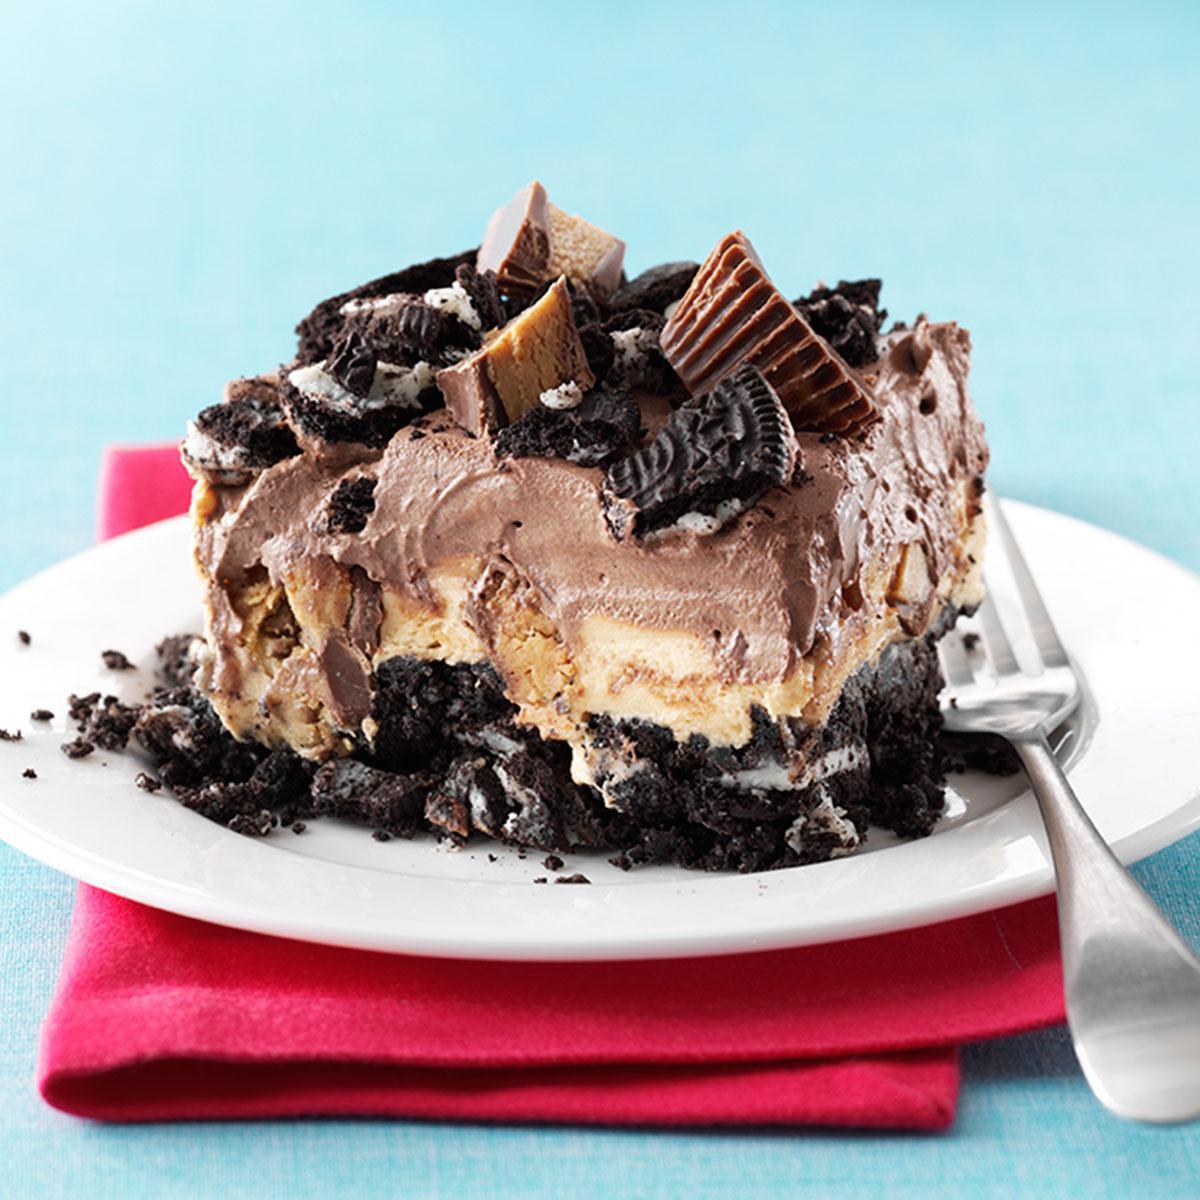 Best Peanut Butter Desserts  Peanut Butter Chocolate Dessert Recipe